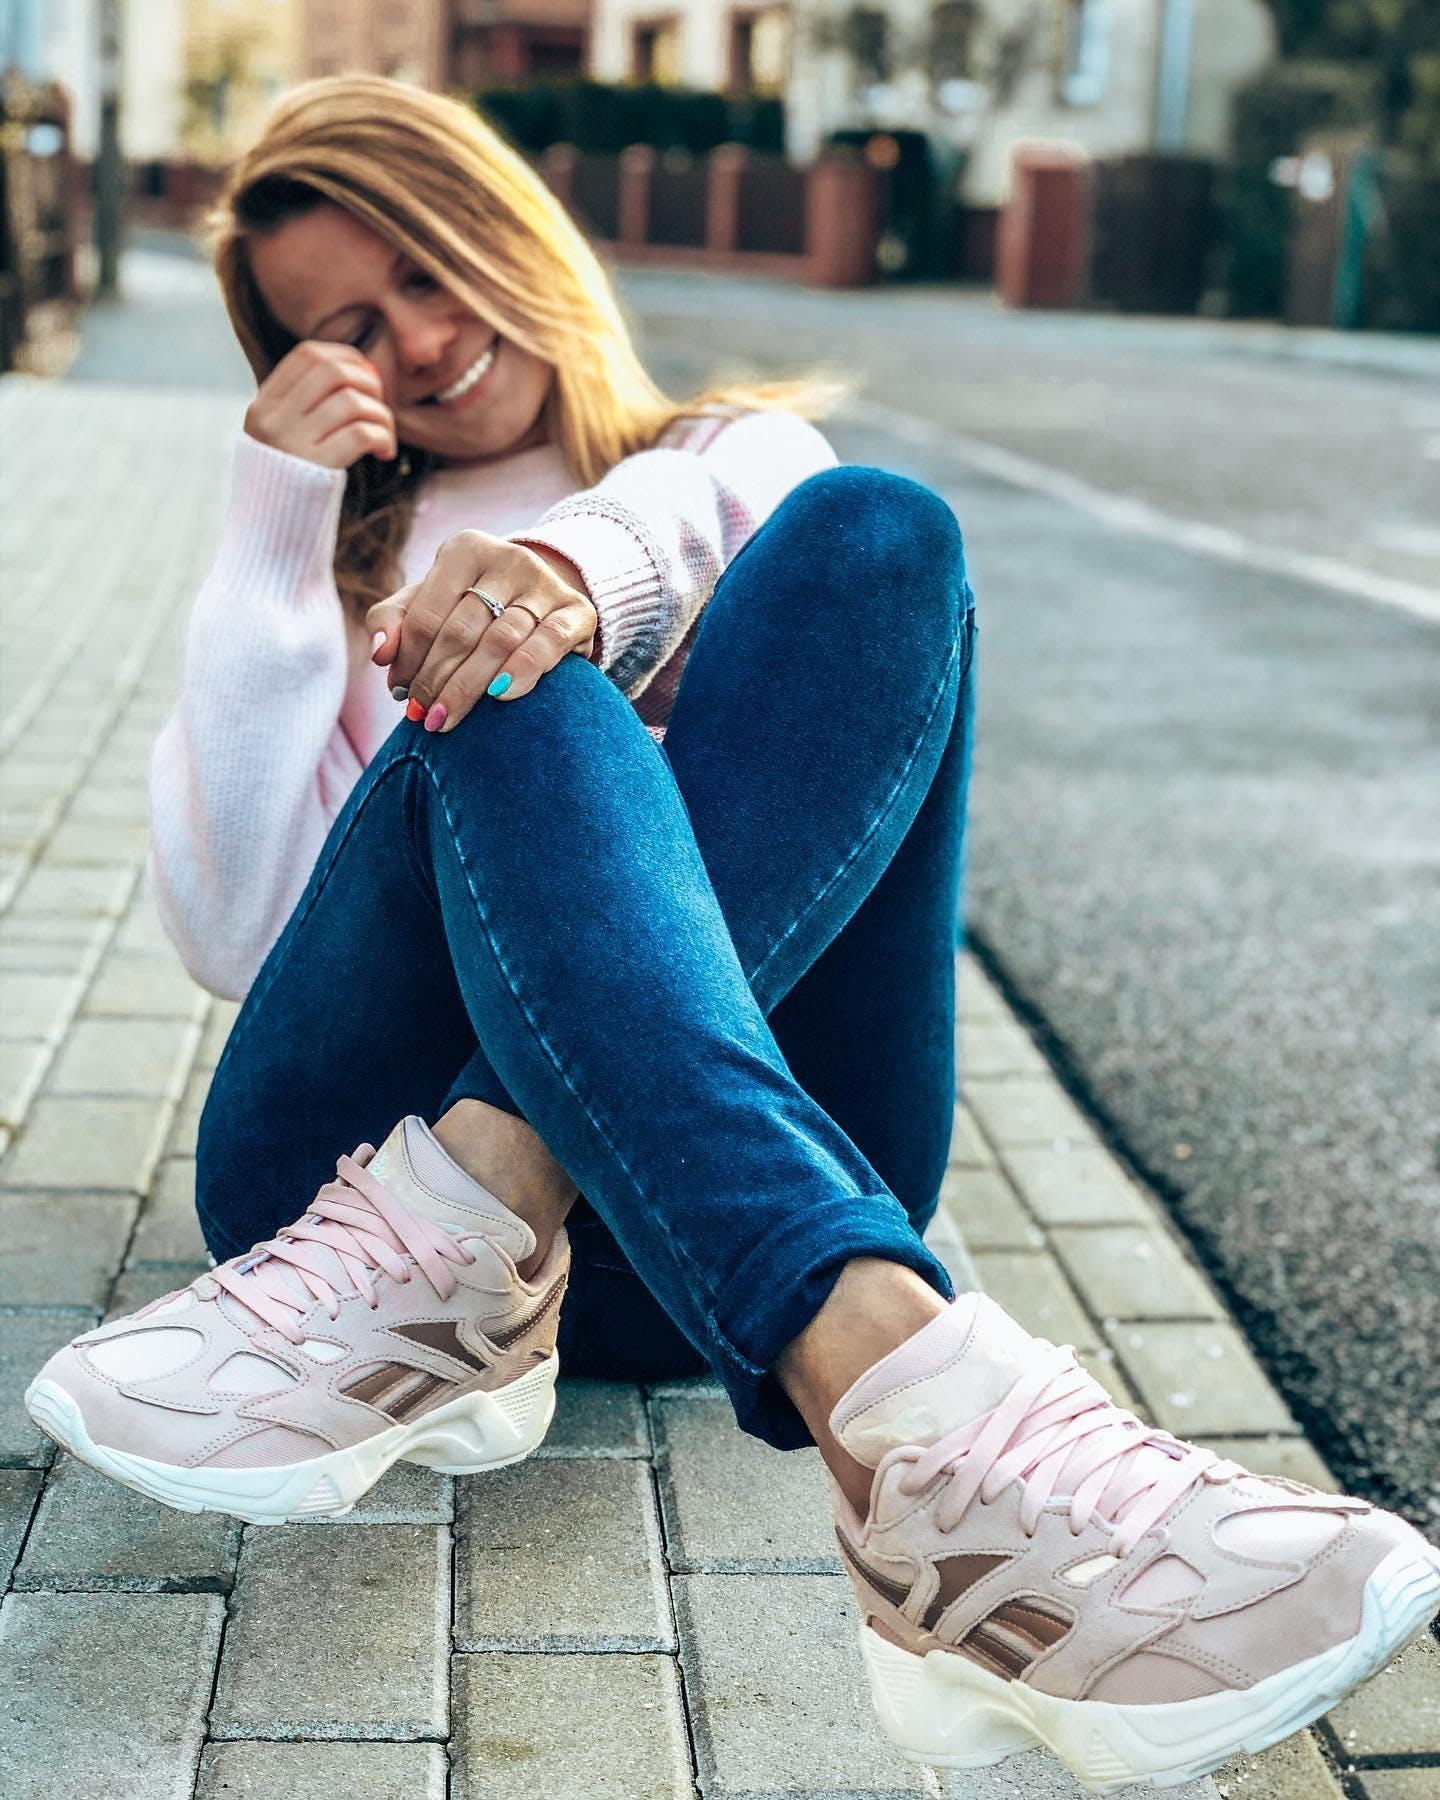 Nye Reebok Classic Nylon Cold Pastel Dame Sko Kjøpe På